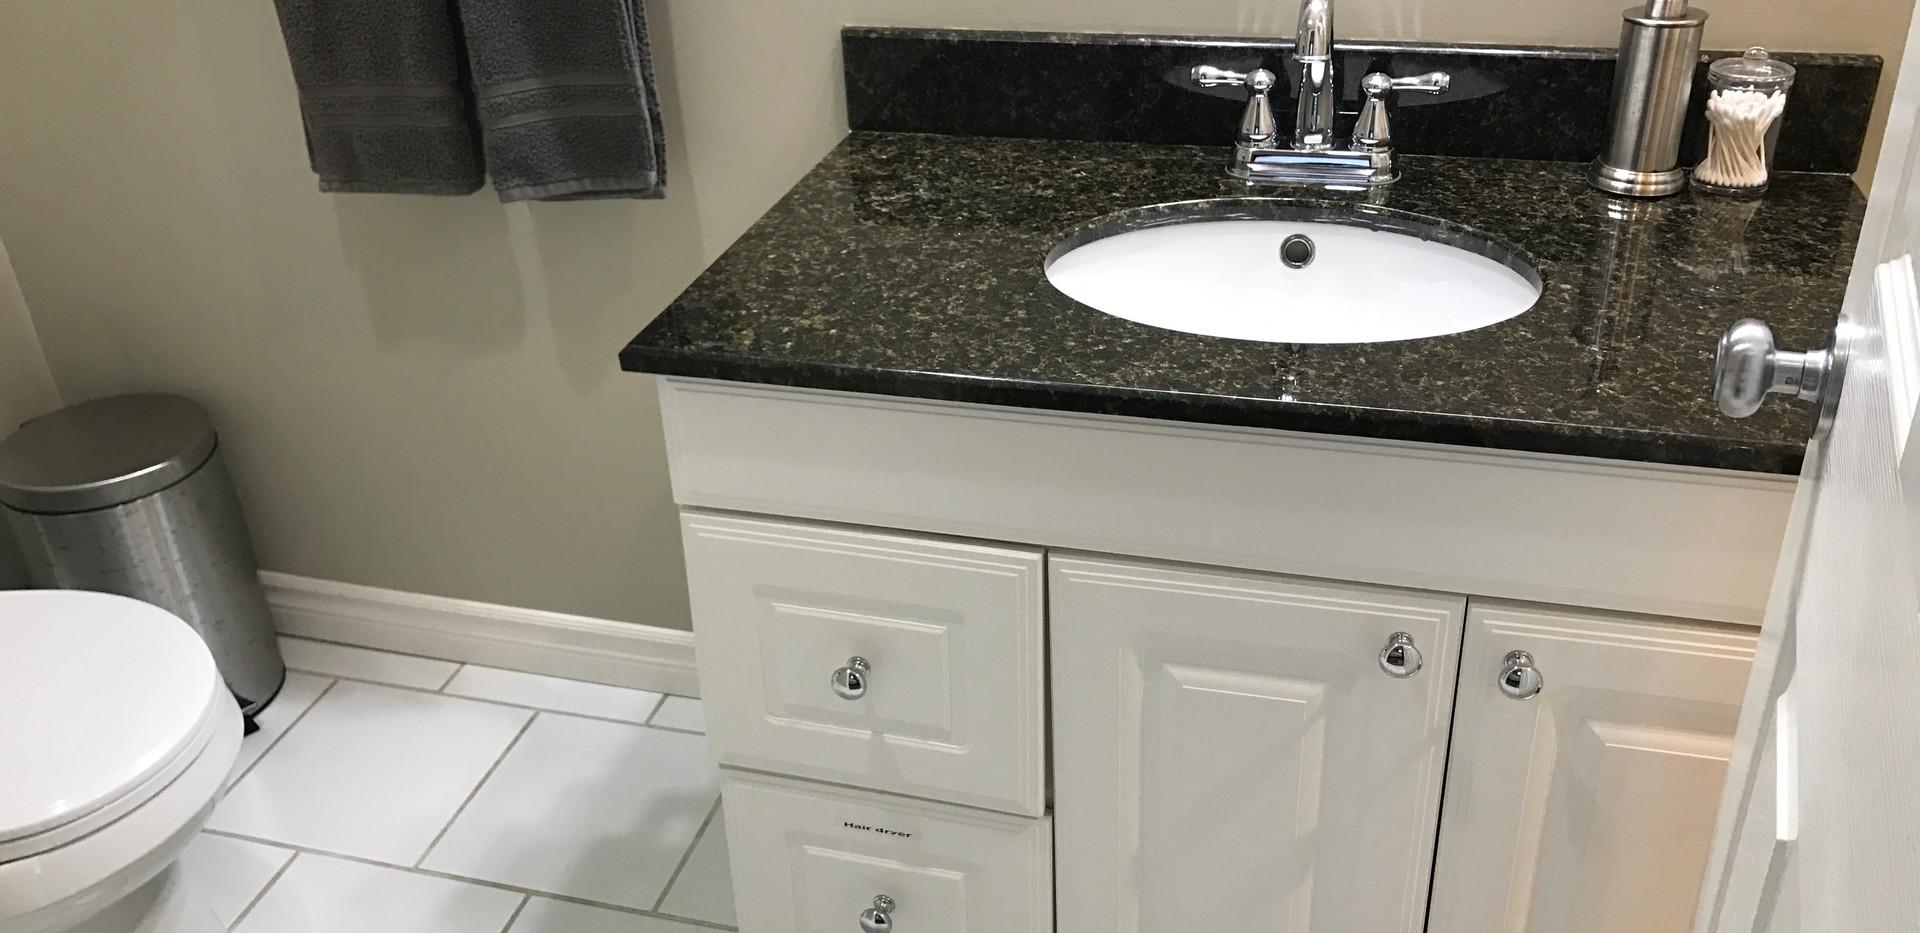 Sink, hand dryer in drawer